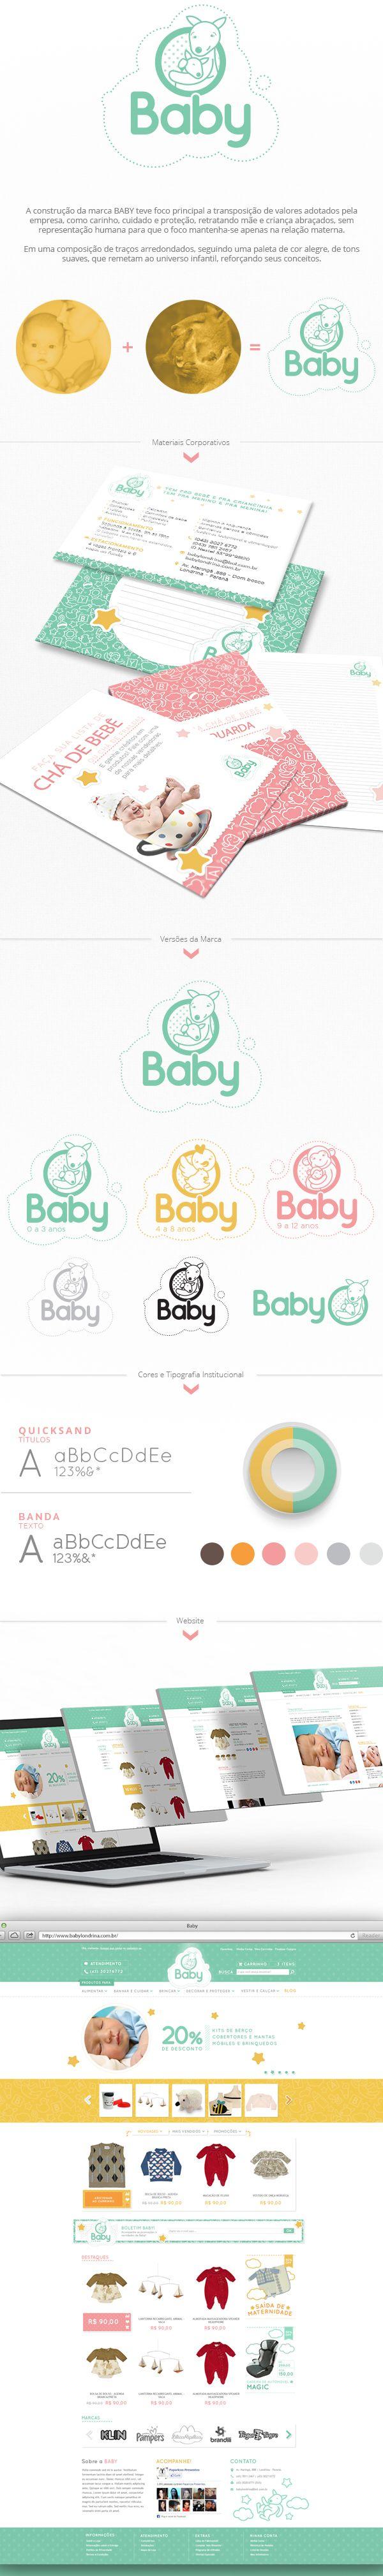 Baby on Behance